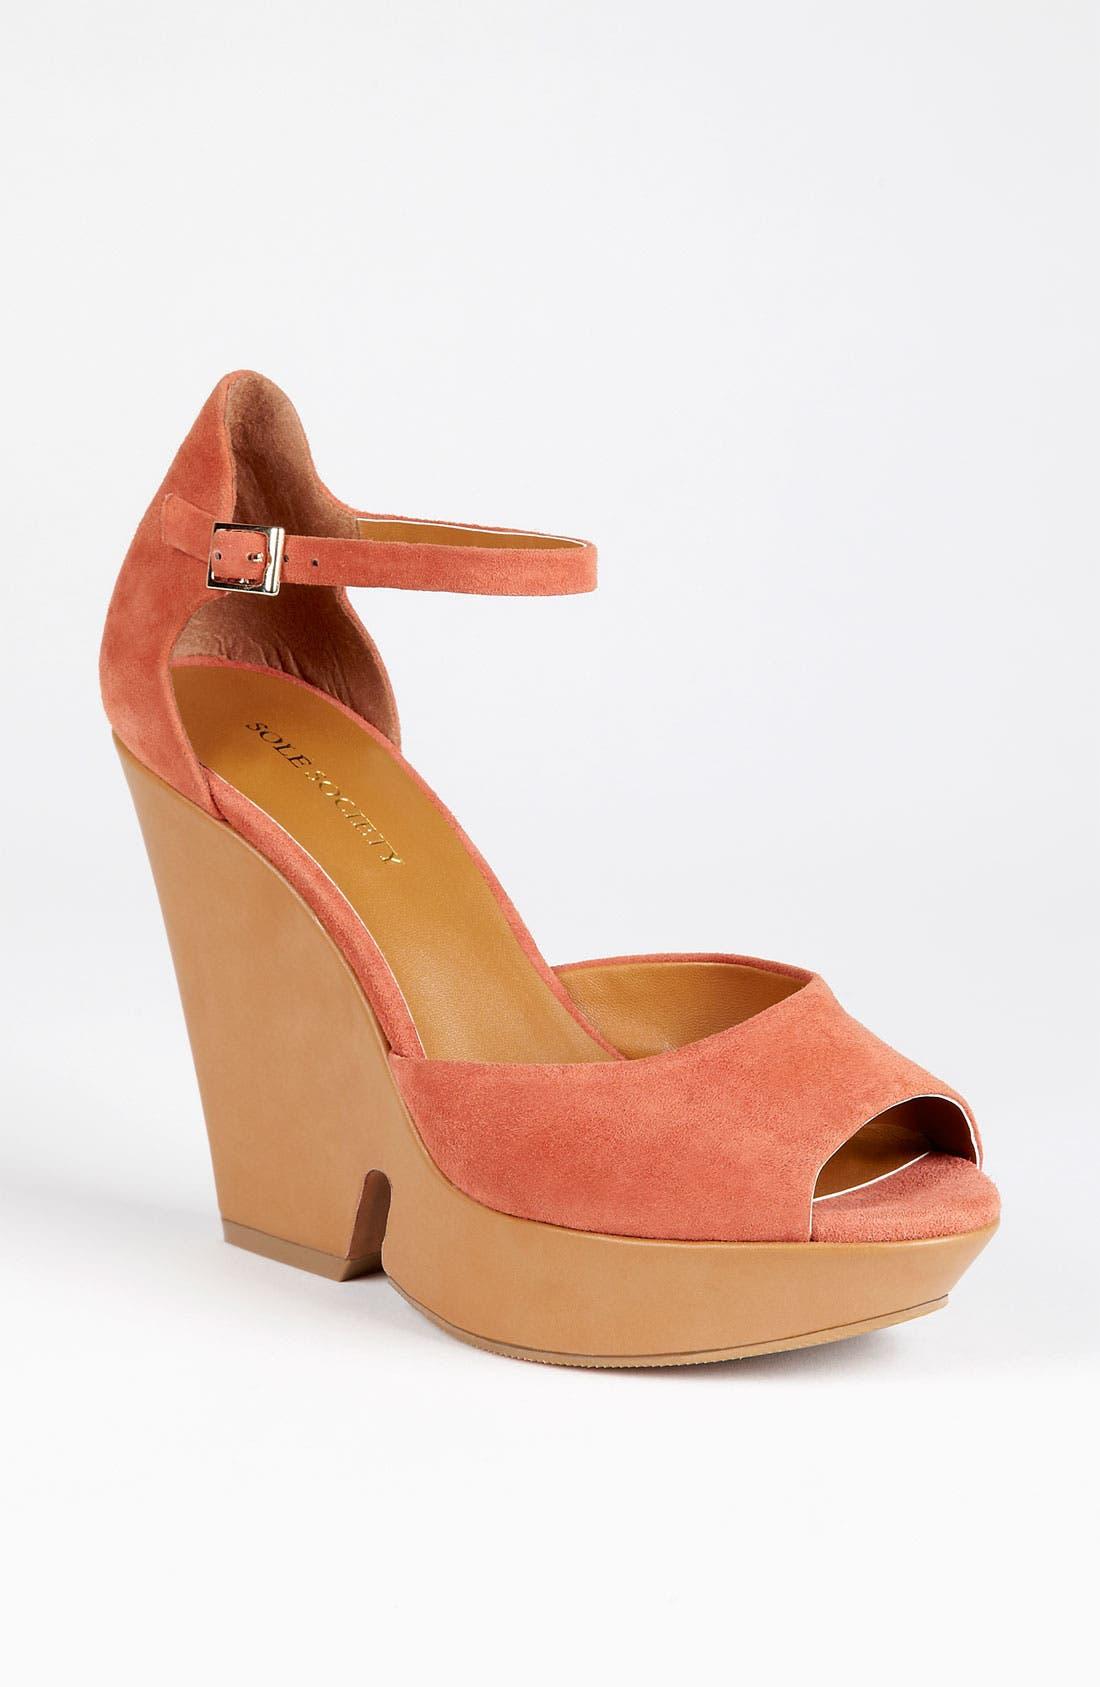 Main Image - Sole Society 'Audrey' Sandal